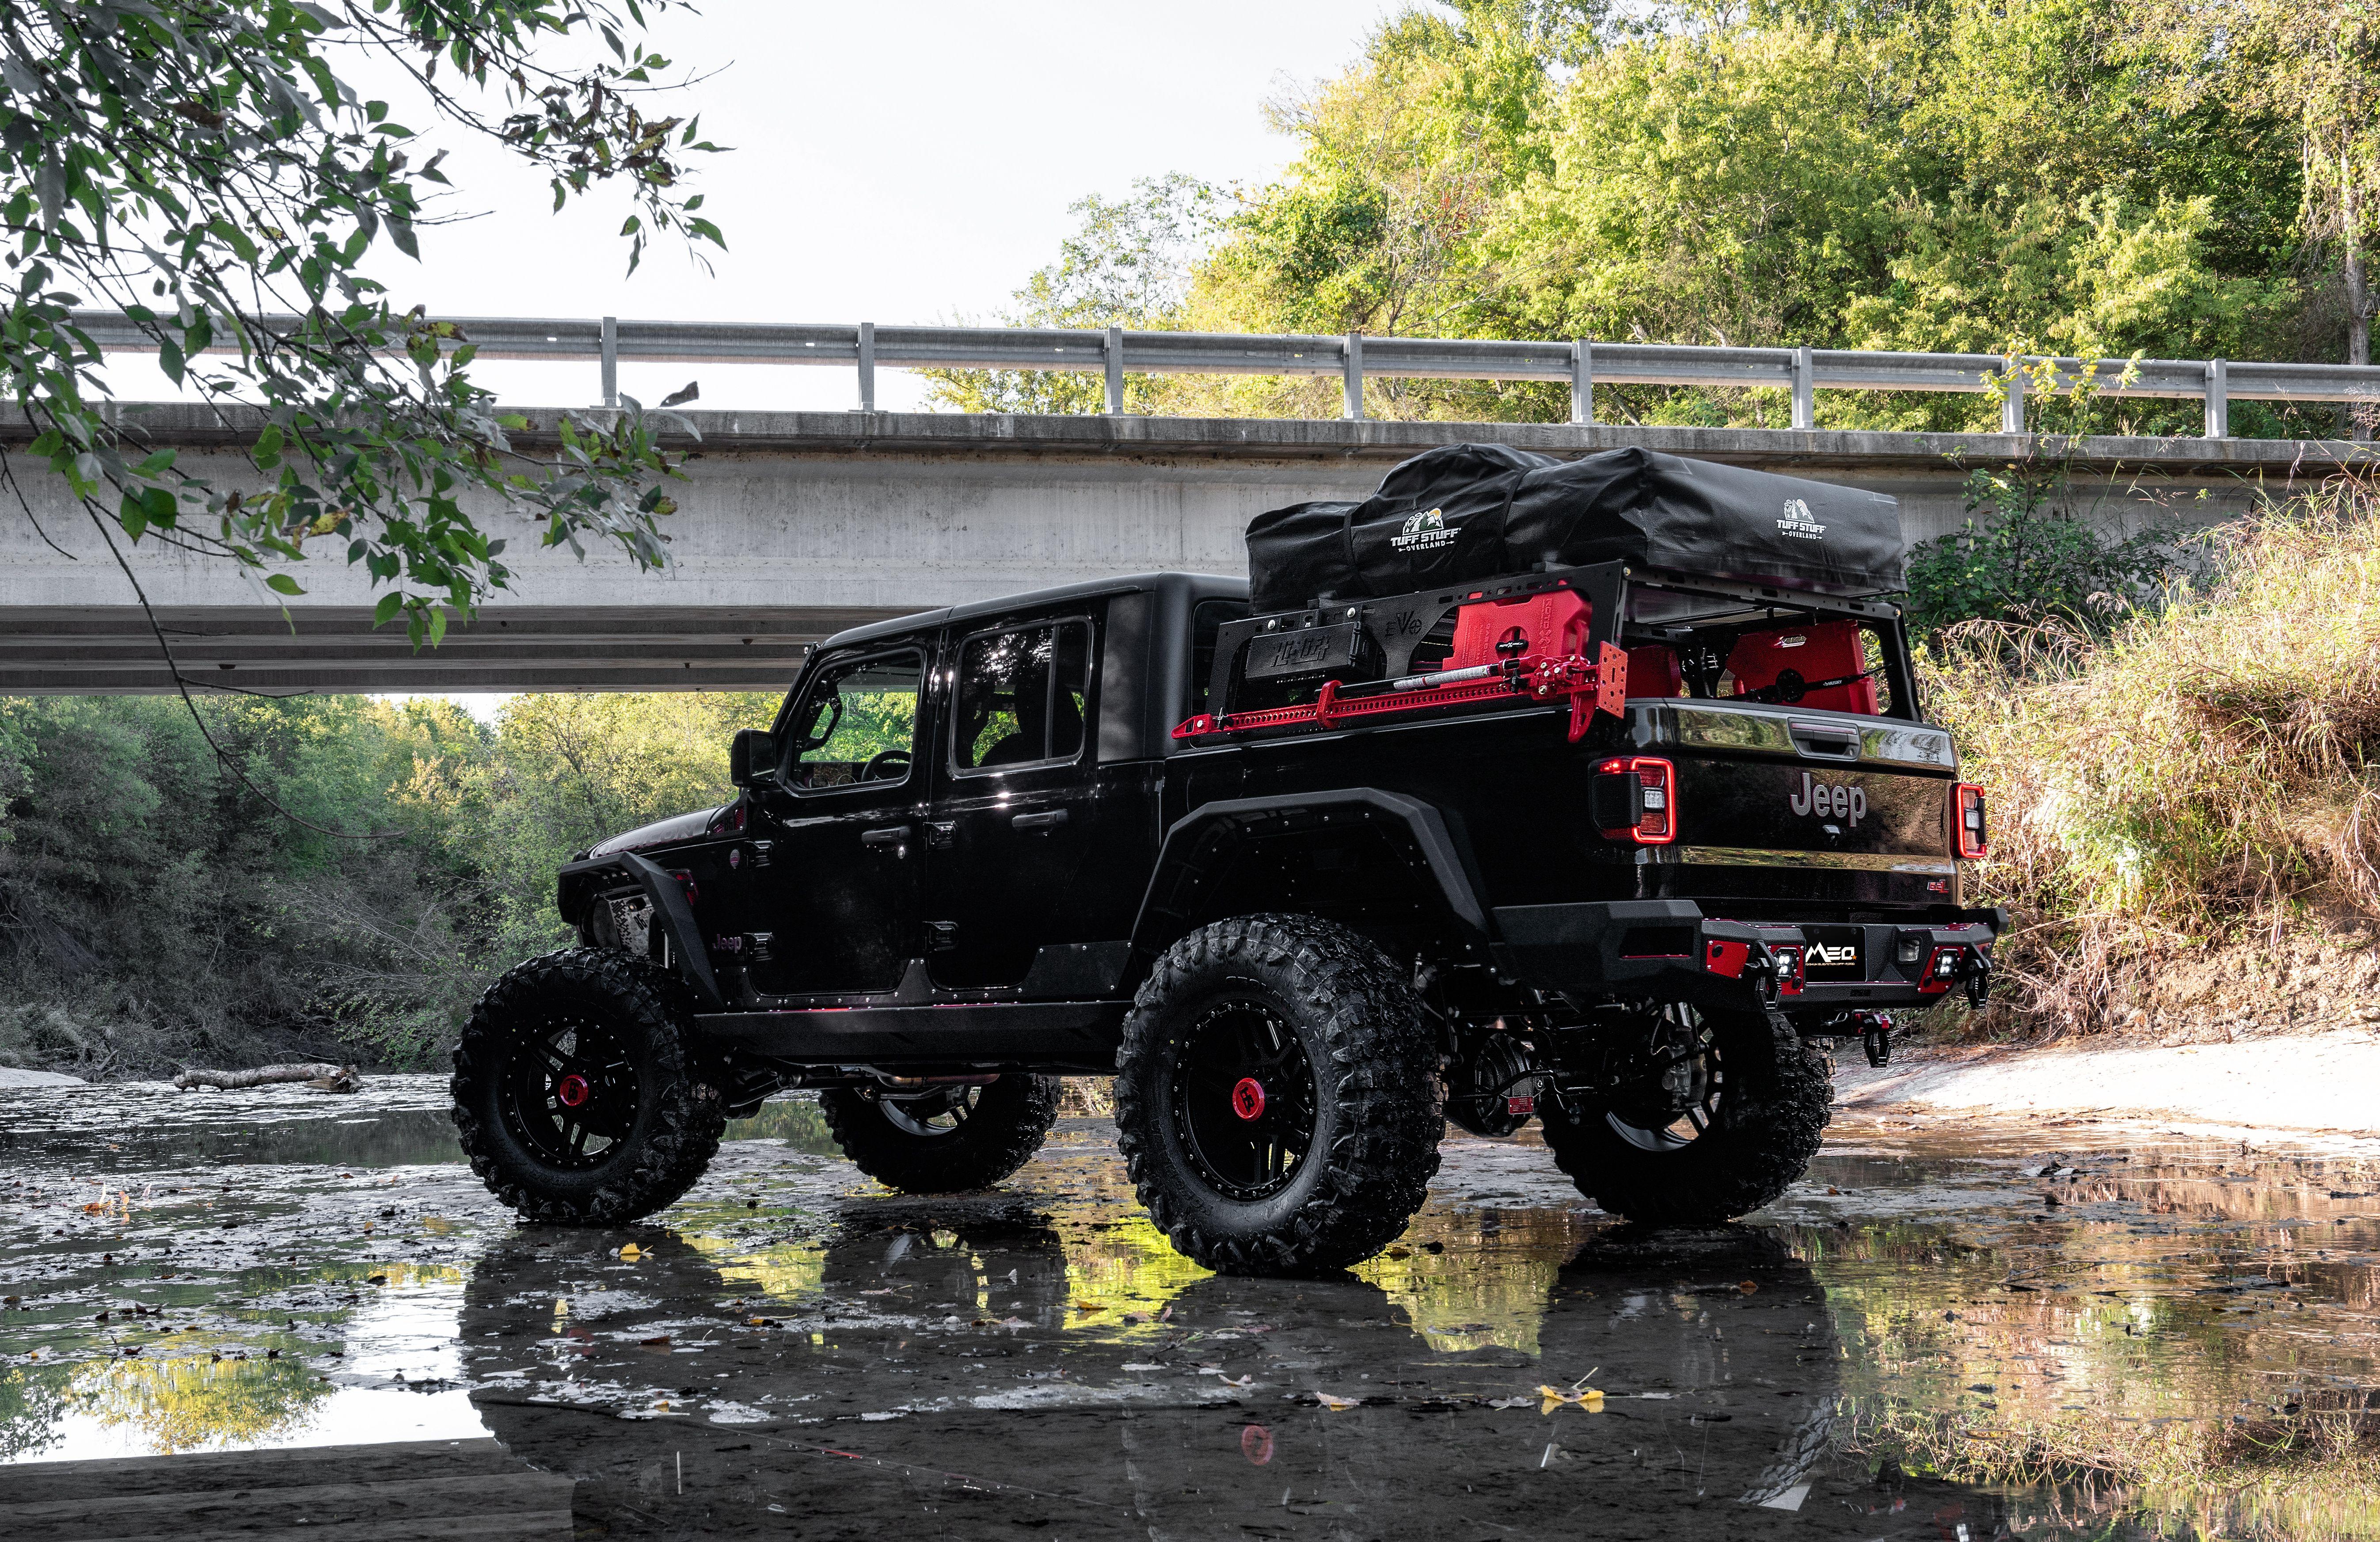 V8 6 2l Max D Stage 3 2020 Jeep Gladiator Rubicon In 2020 Jeep Gladiator Jeep Gladiator